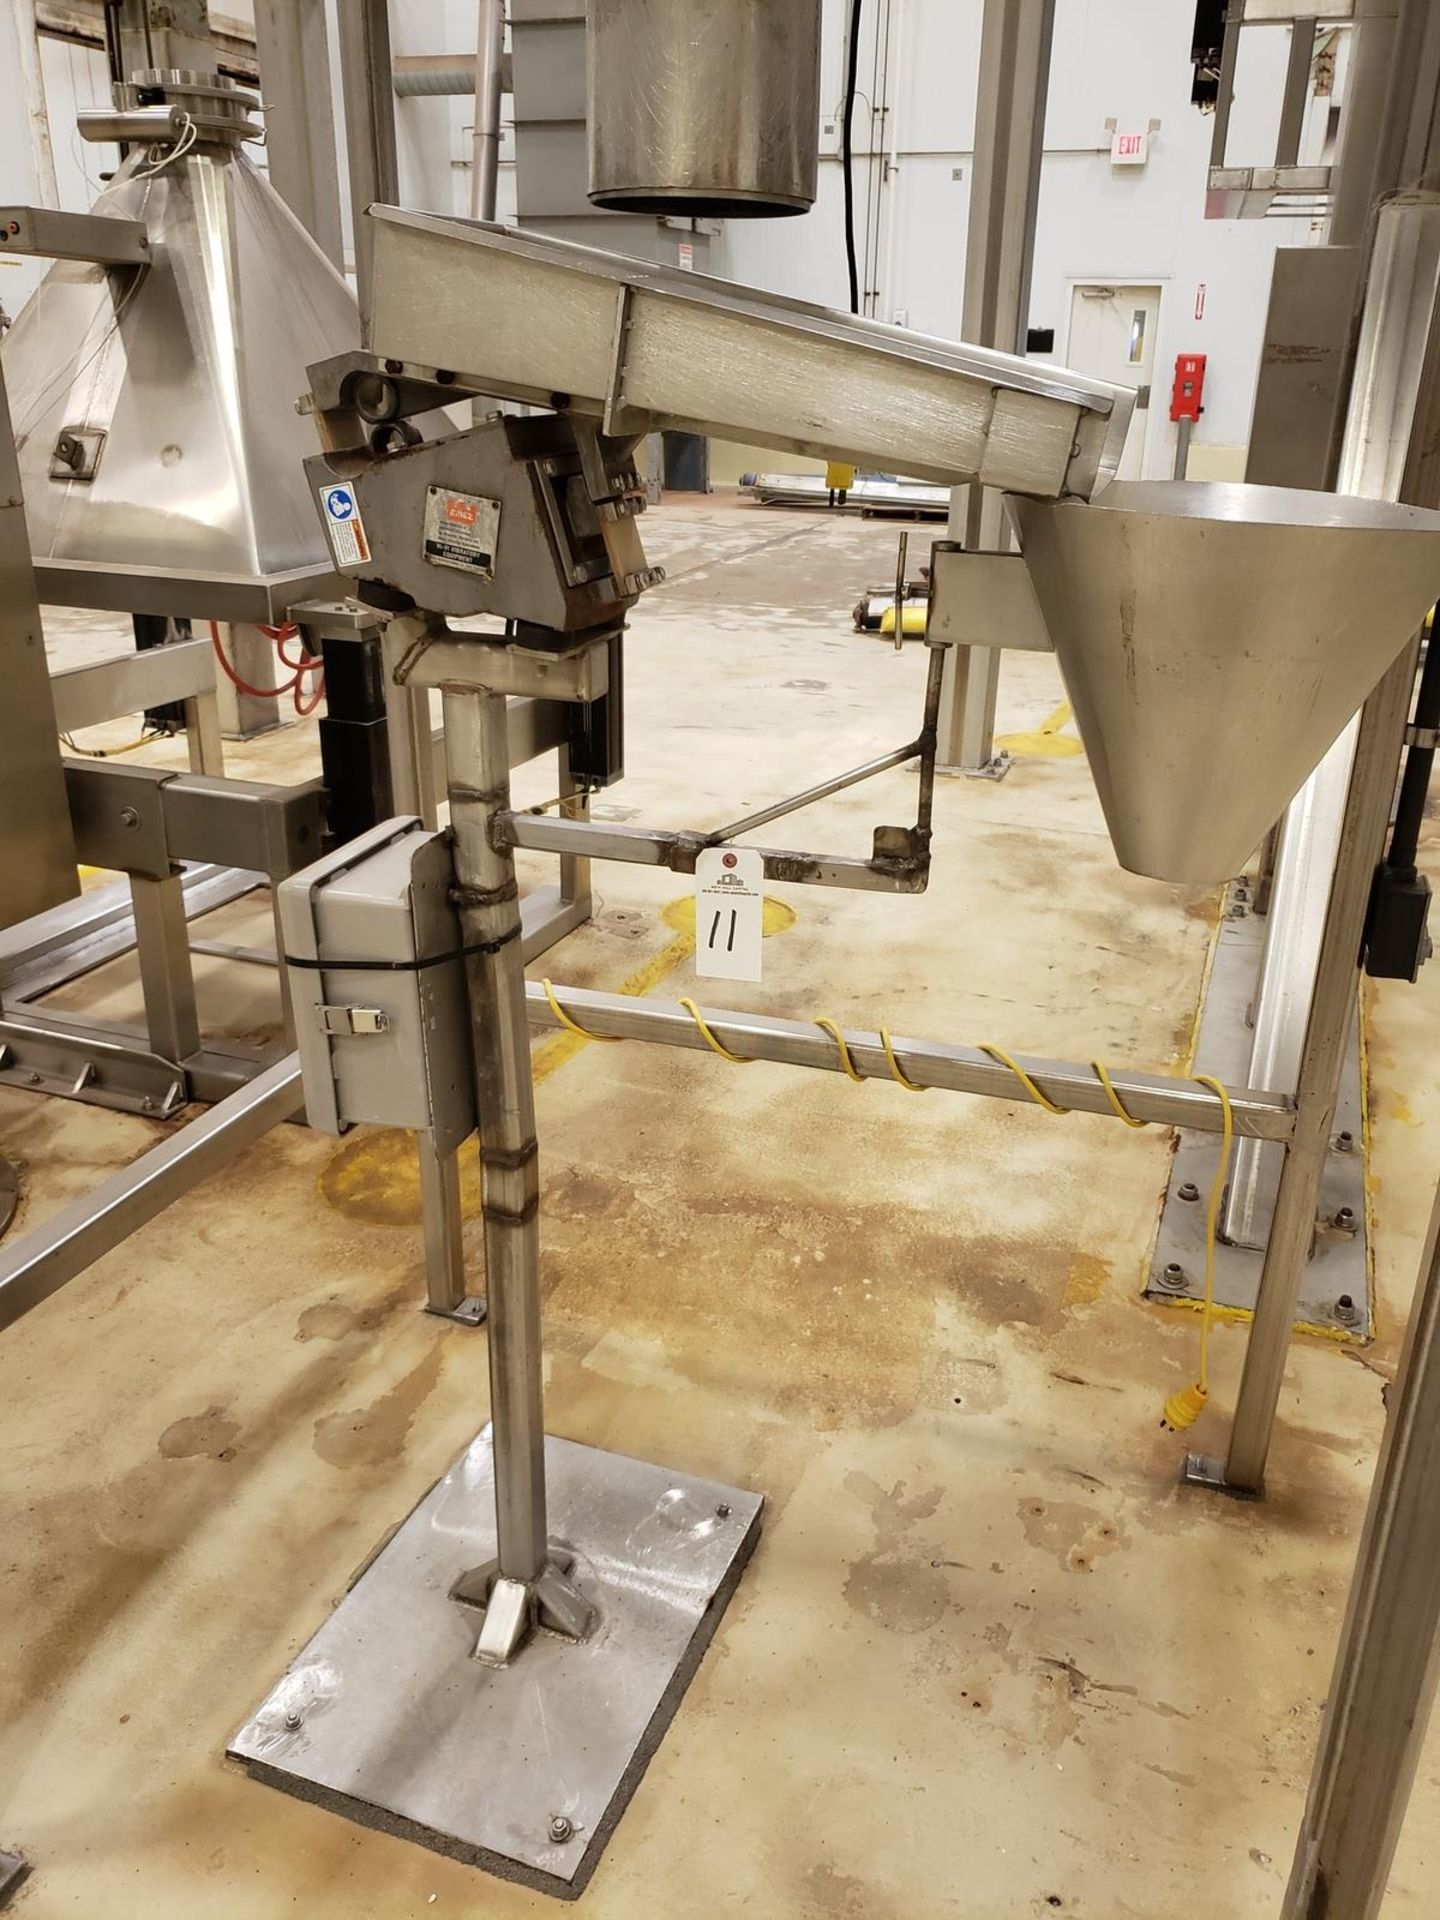 Lot 11 - Eriez Vibratory Shaker Conveyor, M# 36C, S/N 203697 - Loc: NJ | Rig Fee: $75